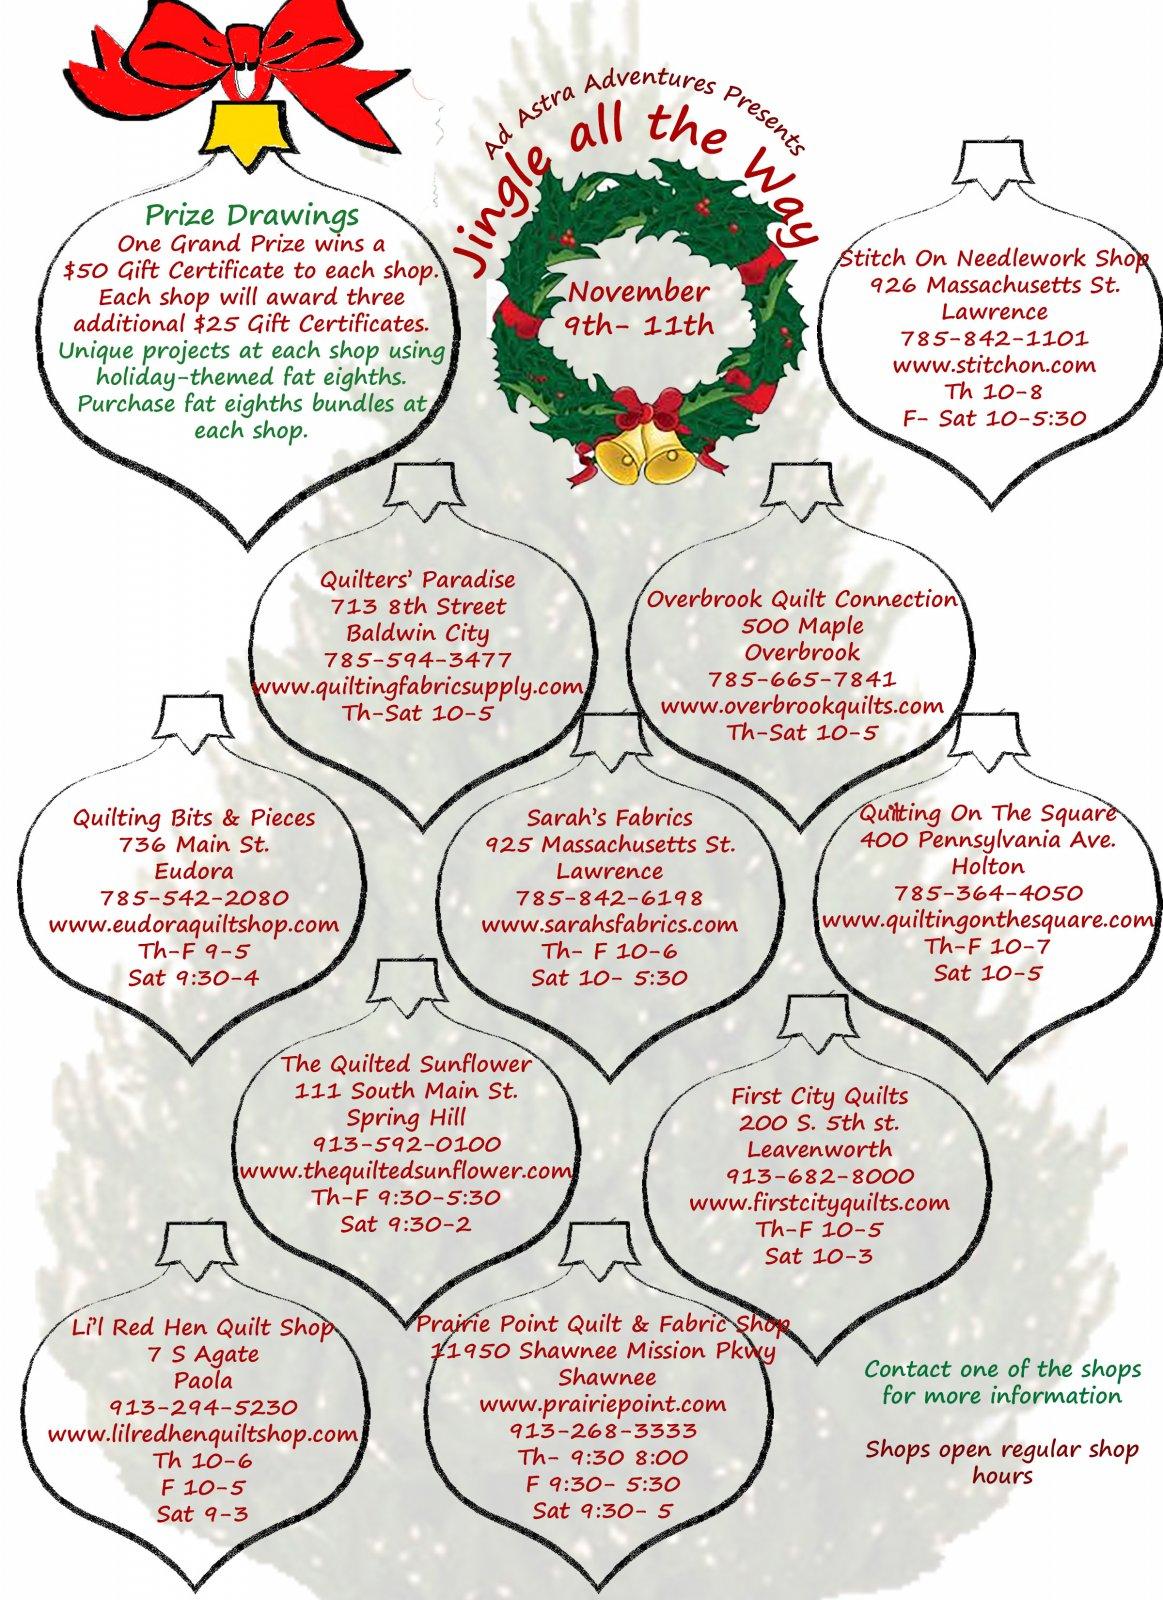 Ad Astra Adventures presents the.... Jingle All the Way Quilt Shop Hop : 200 quilt shops - Adamdwight.com